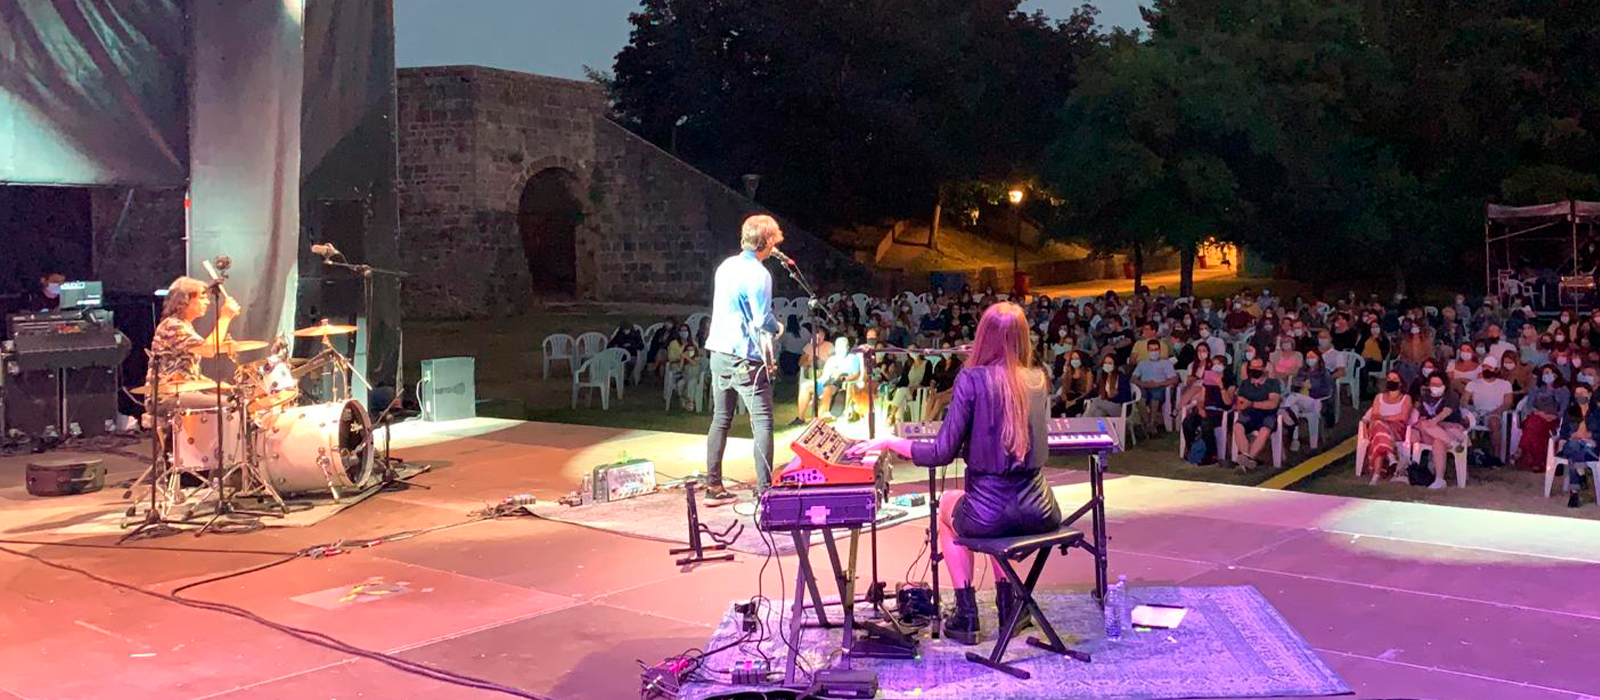 David Otero da comienzo a su gira 'Otero y Yo' en la Ciudadela de Pamplona